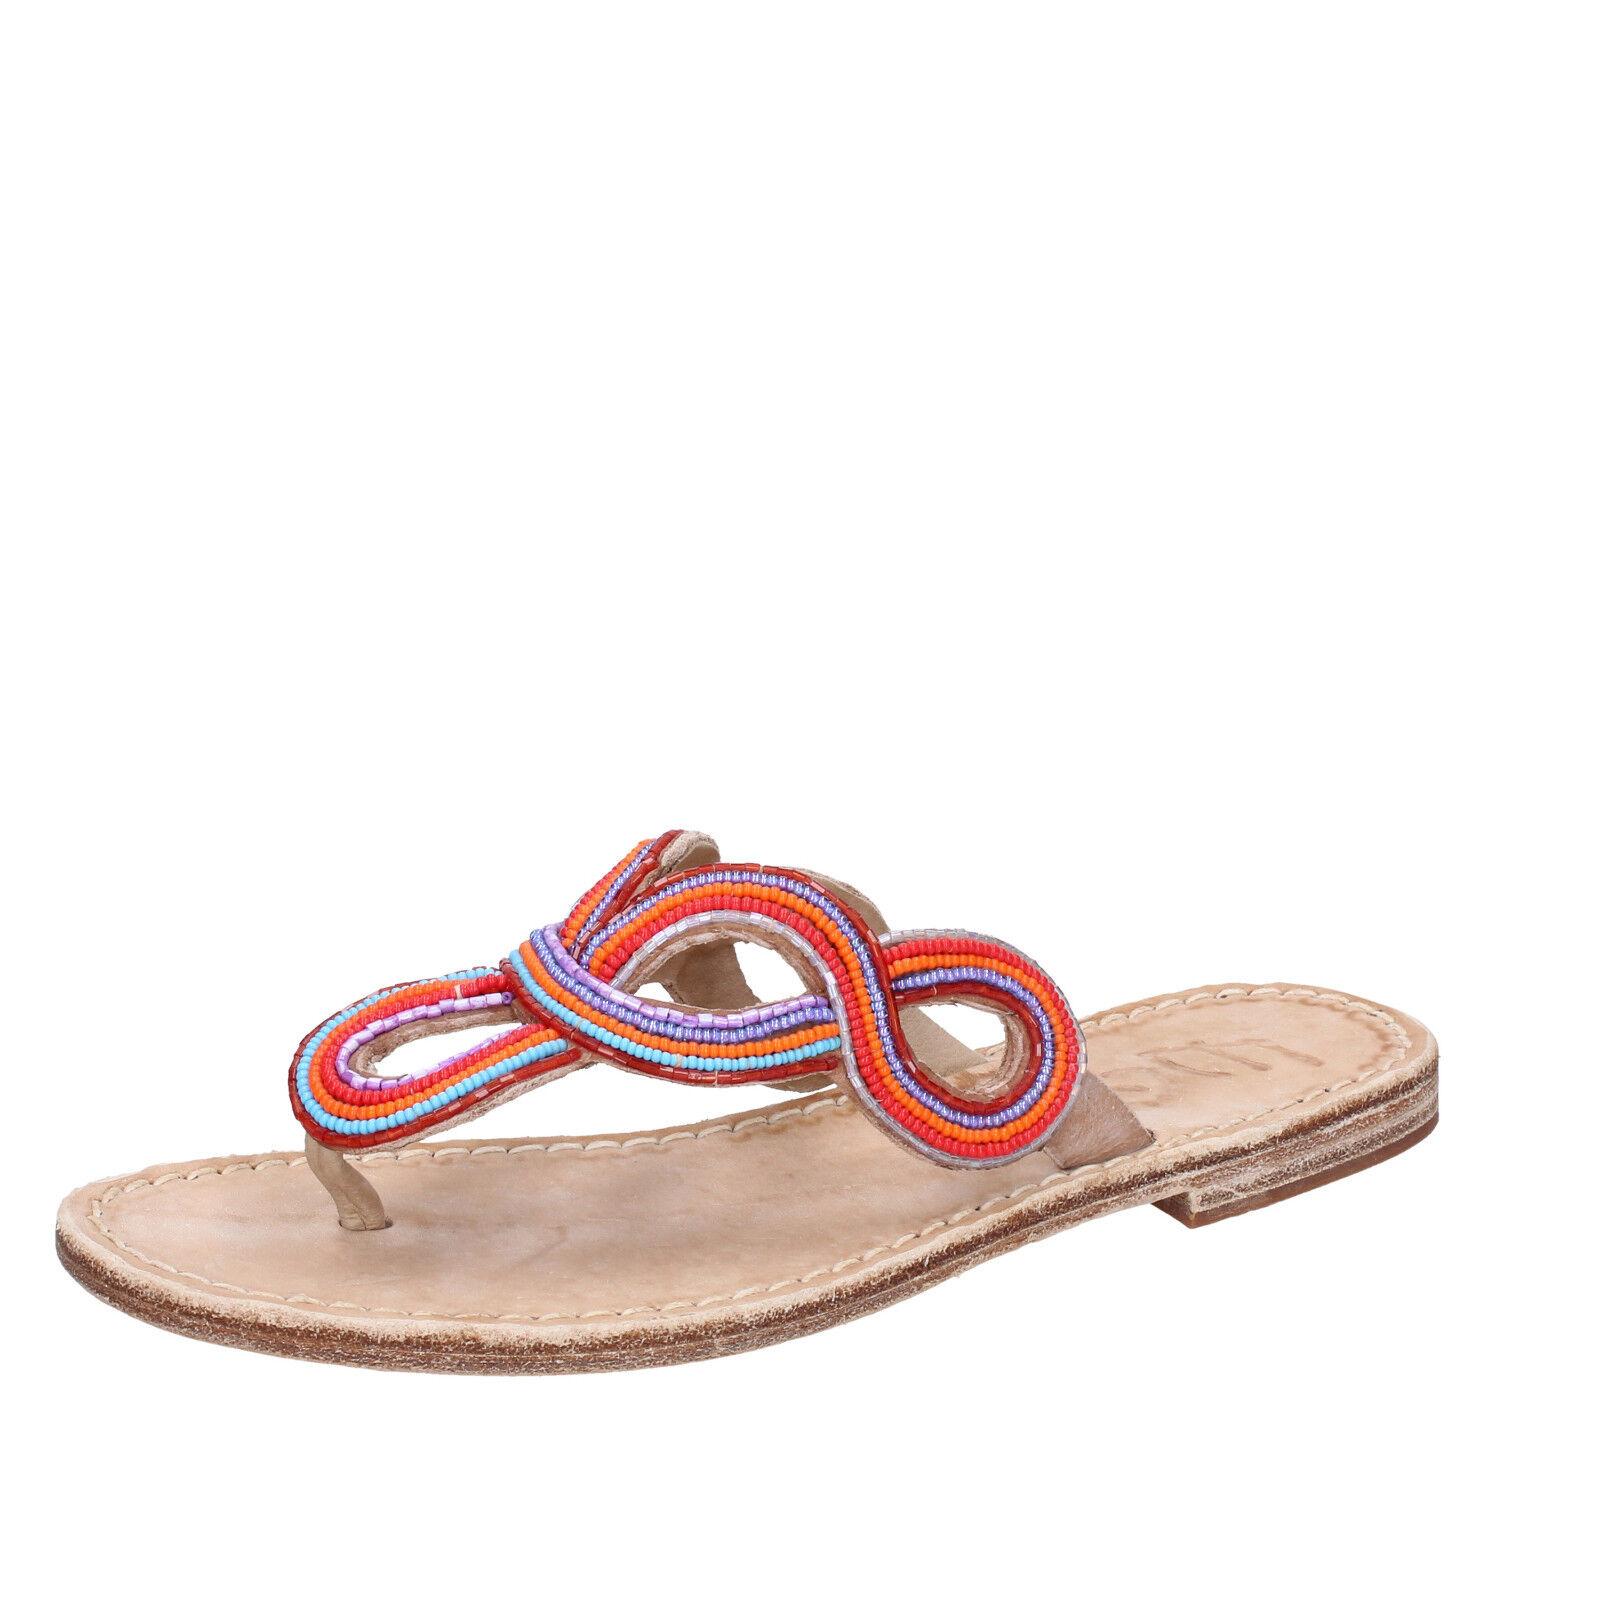 Para mujeres Zapatos Eddy Daniele Daniele Daniele 7 (EU 37) Sandalias De Cuero MultiColor AV403  comprar barato